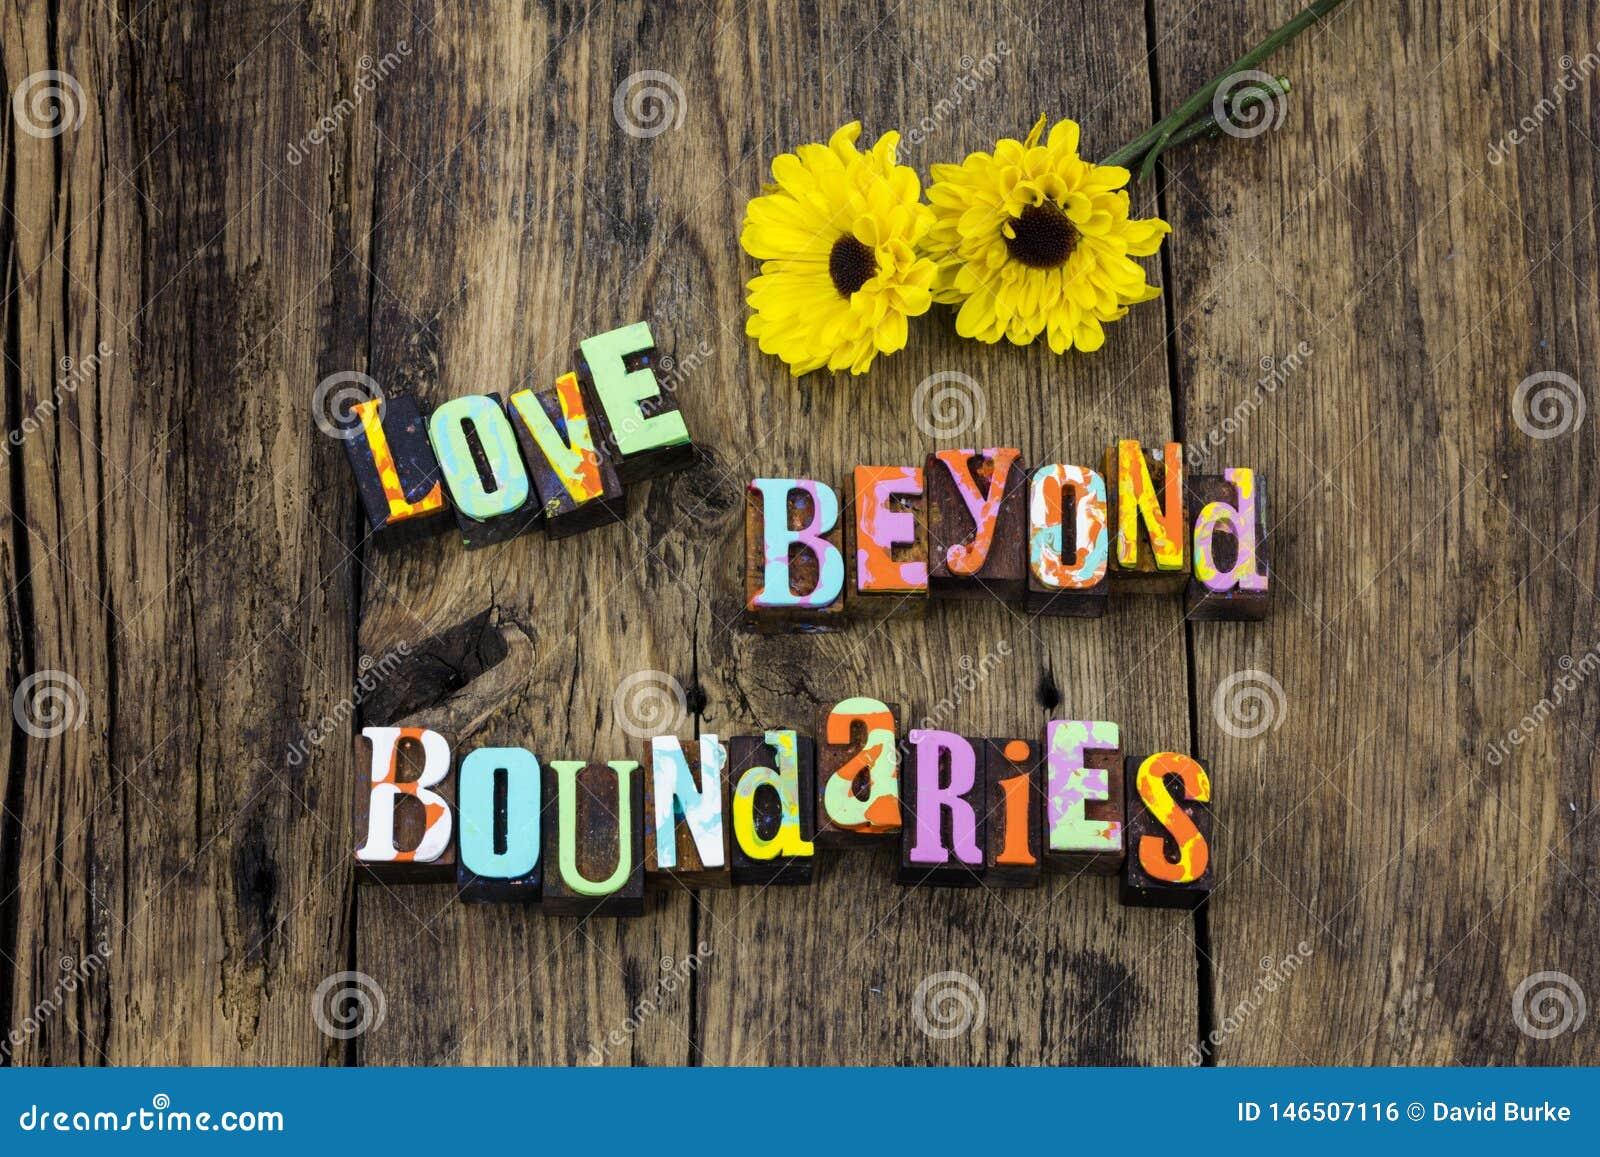 Love life beyond set boundaries rules live